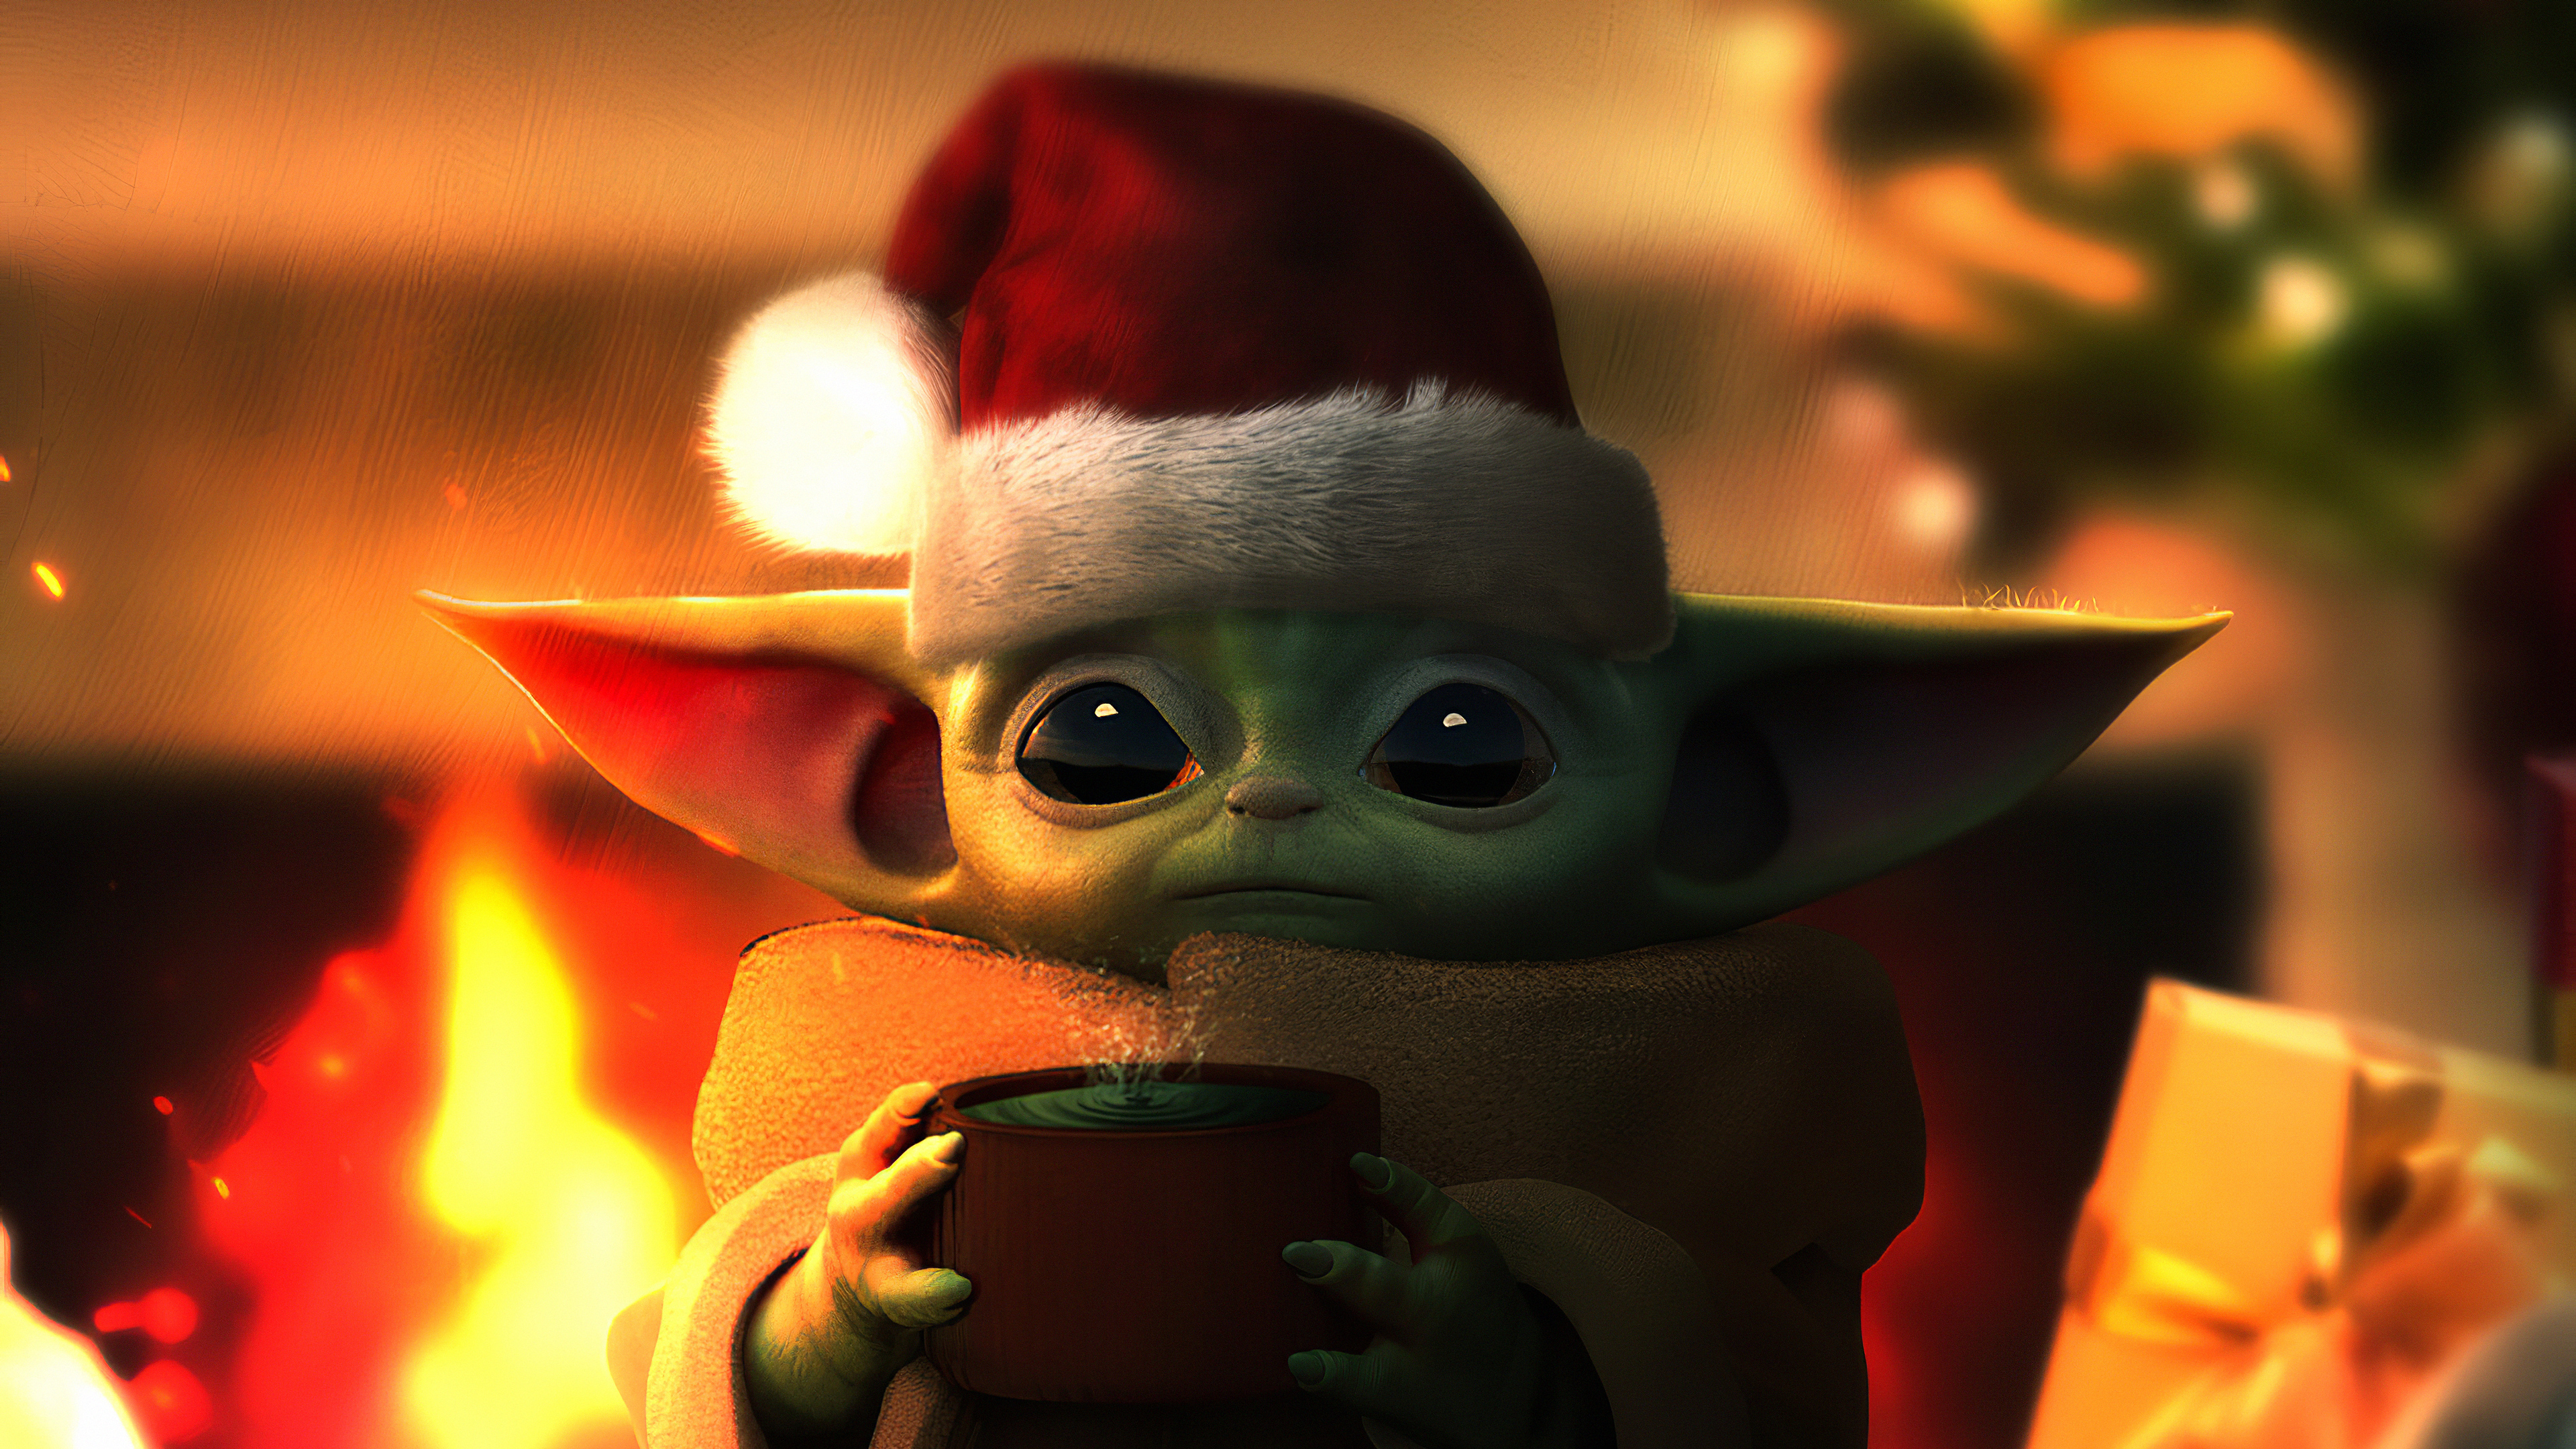 2048x1152 Baby Yoda Christmas 2048x1152 Resolution HD 4k ...